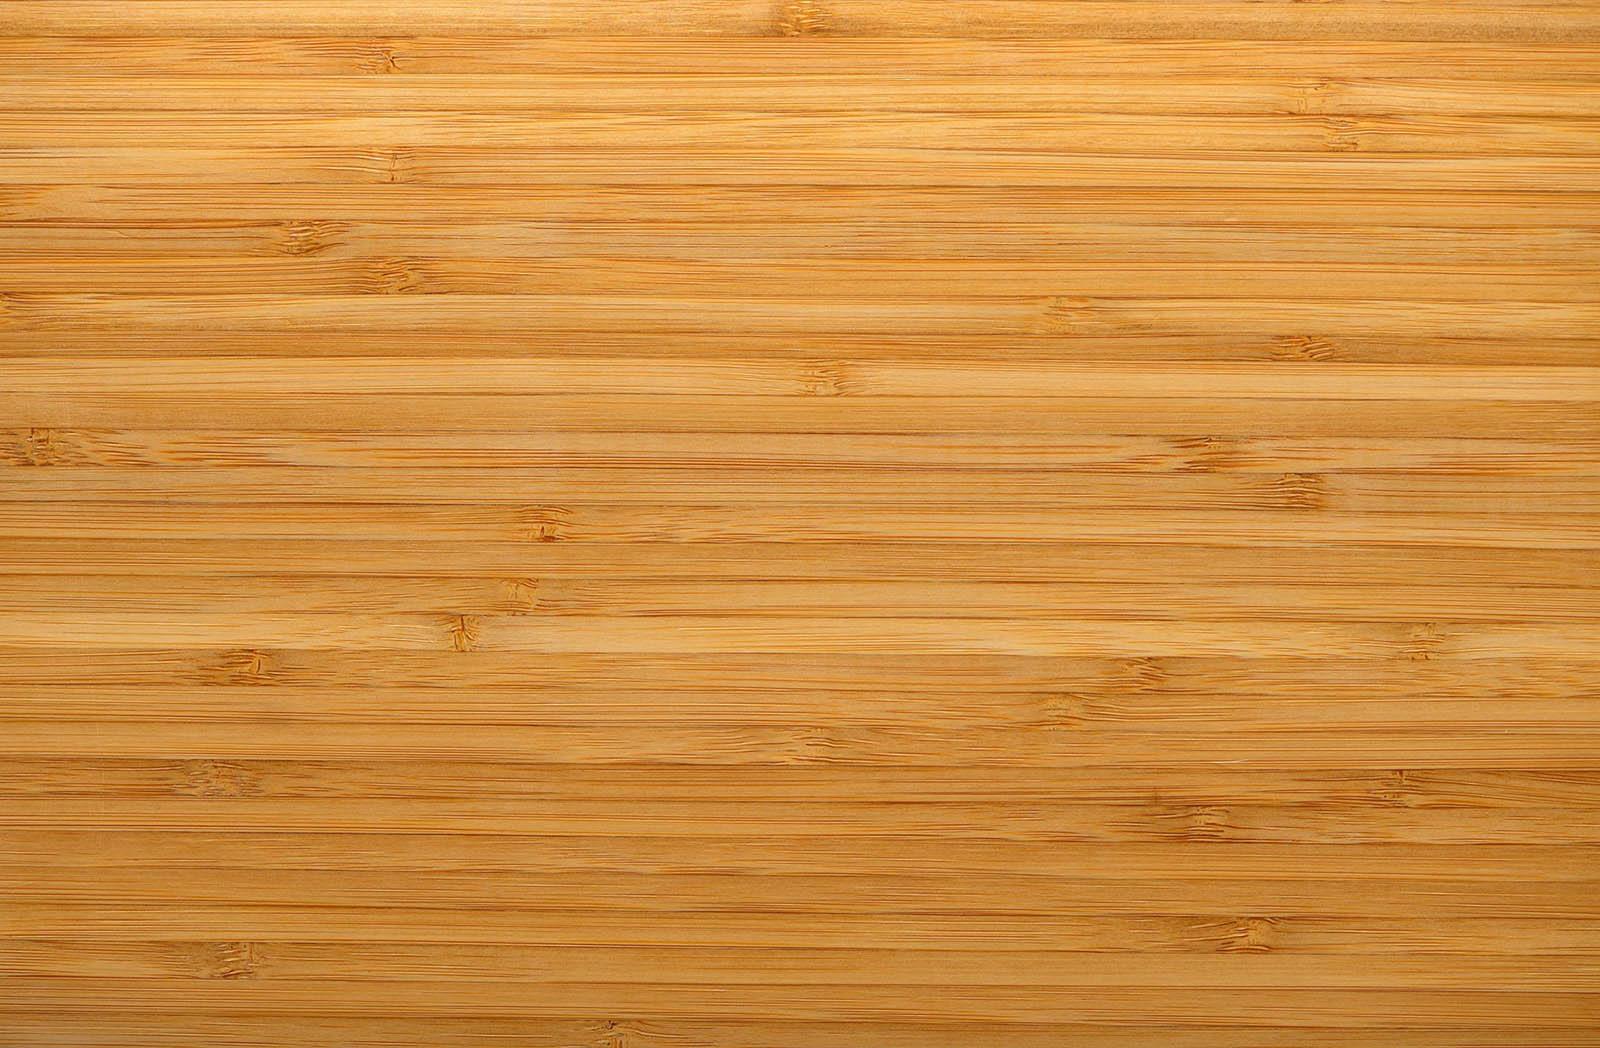 Indoor basketball court background